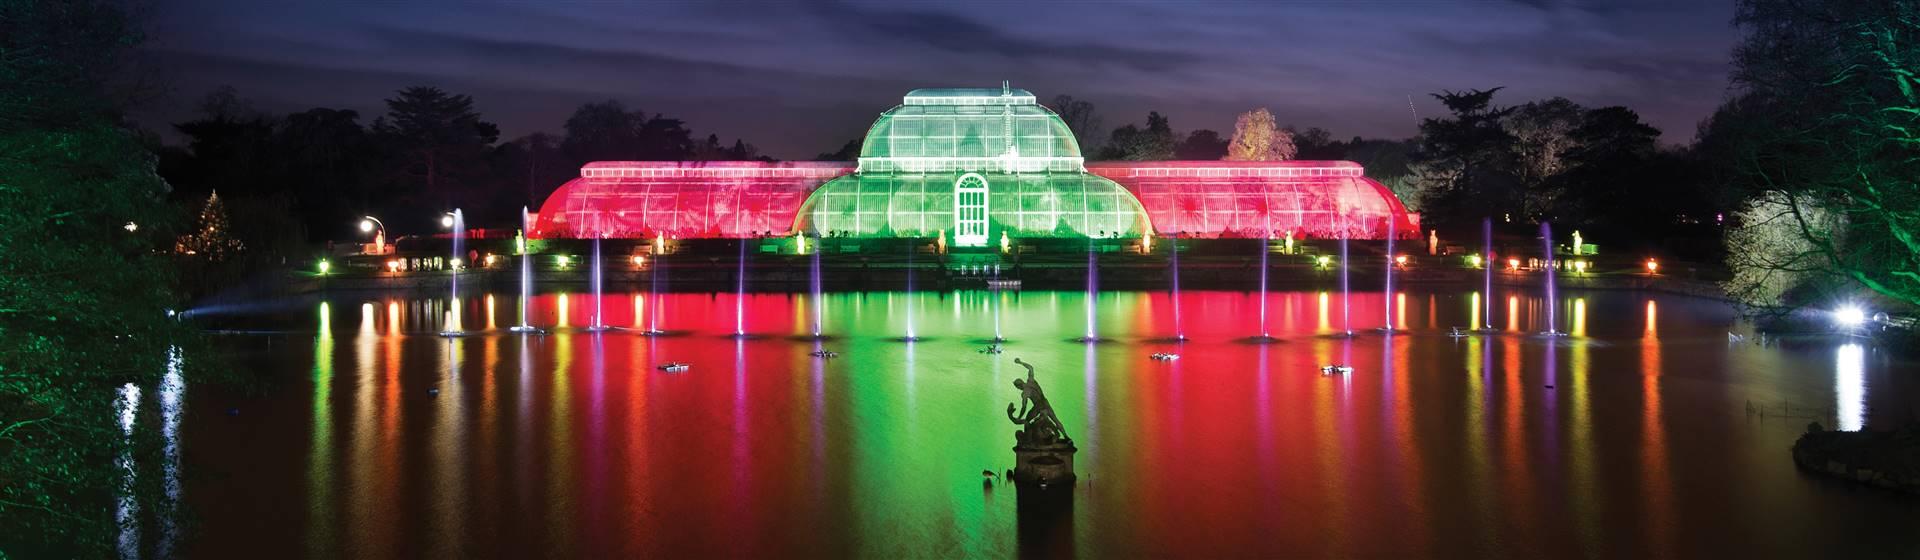 Christmas Twilight at Kew Gardens